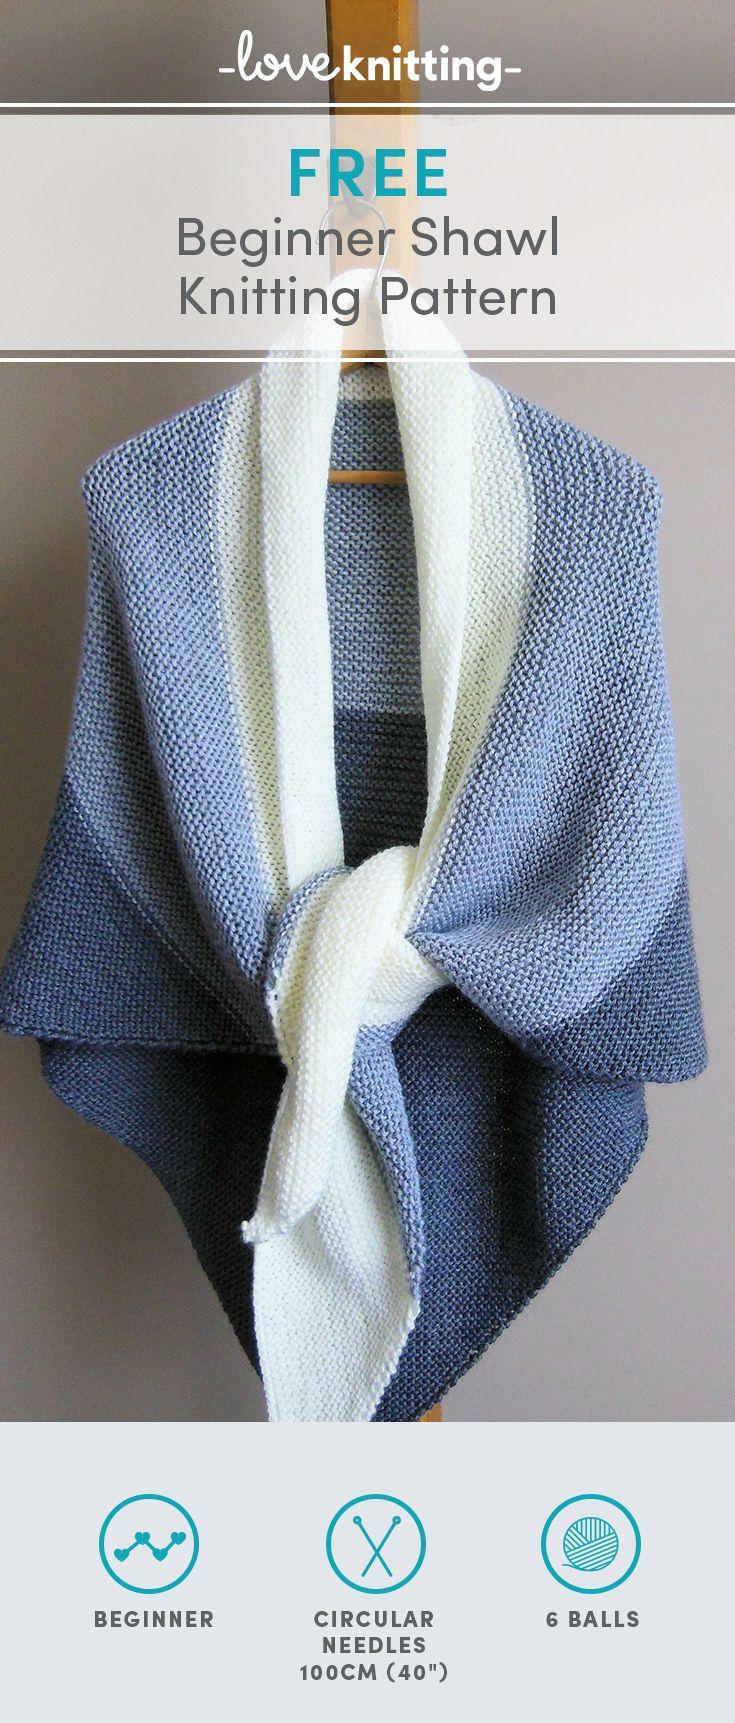 Free Shawl Knitting Pattern for beginners